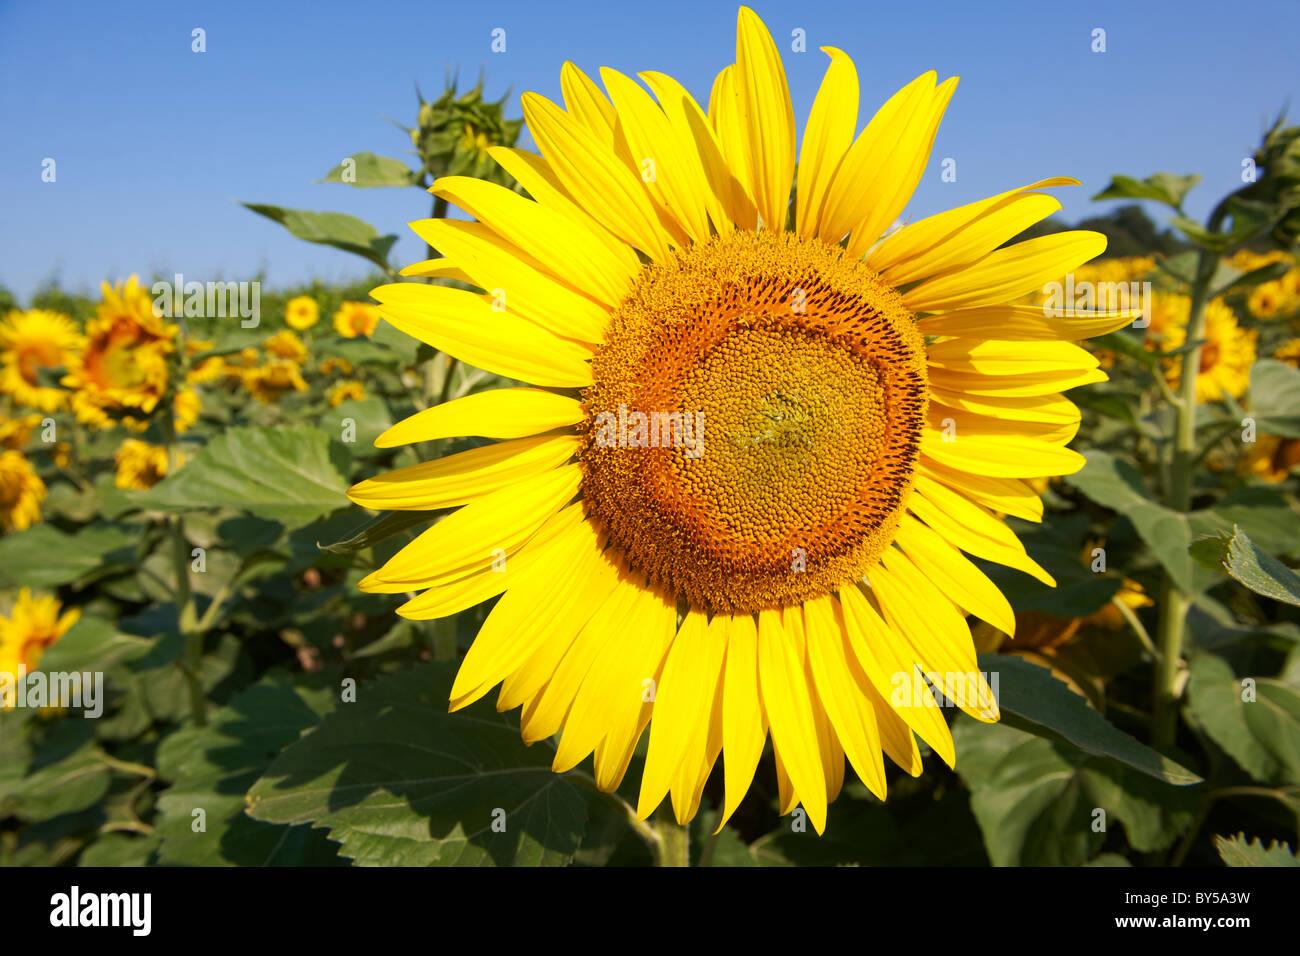 Field of Sunflower flowering heads - Stock Image